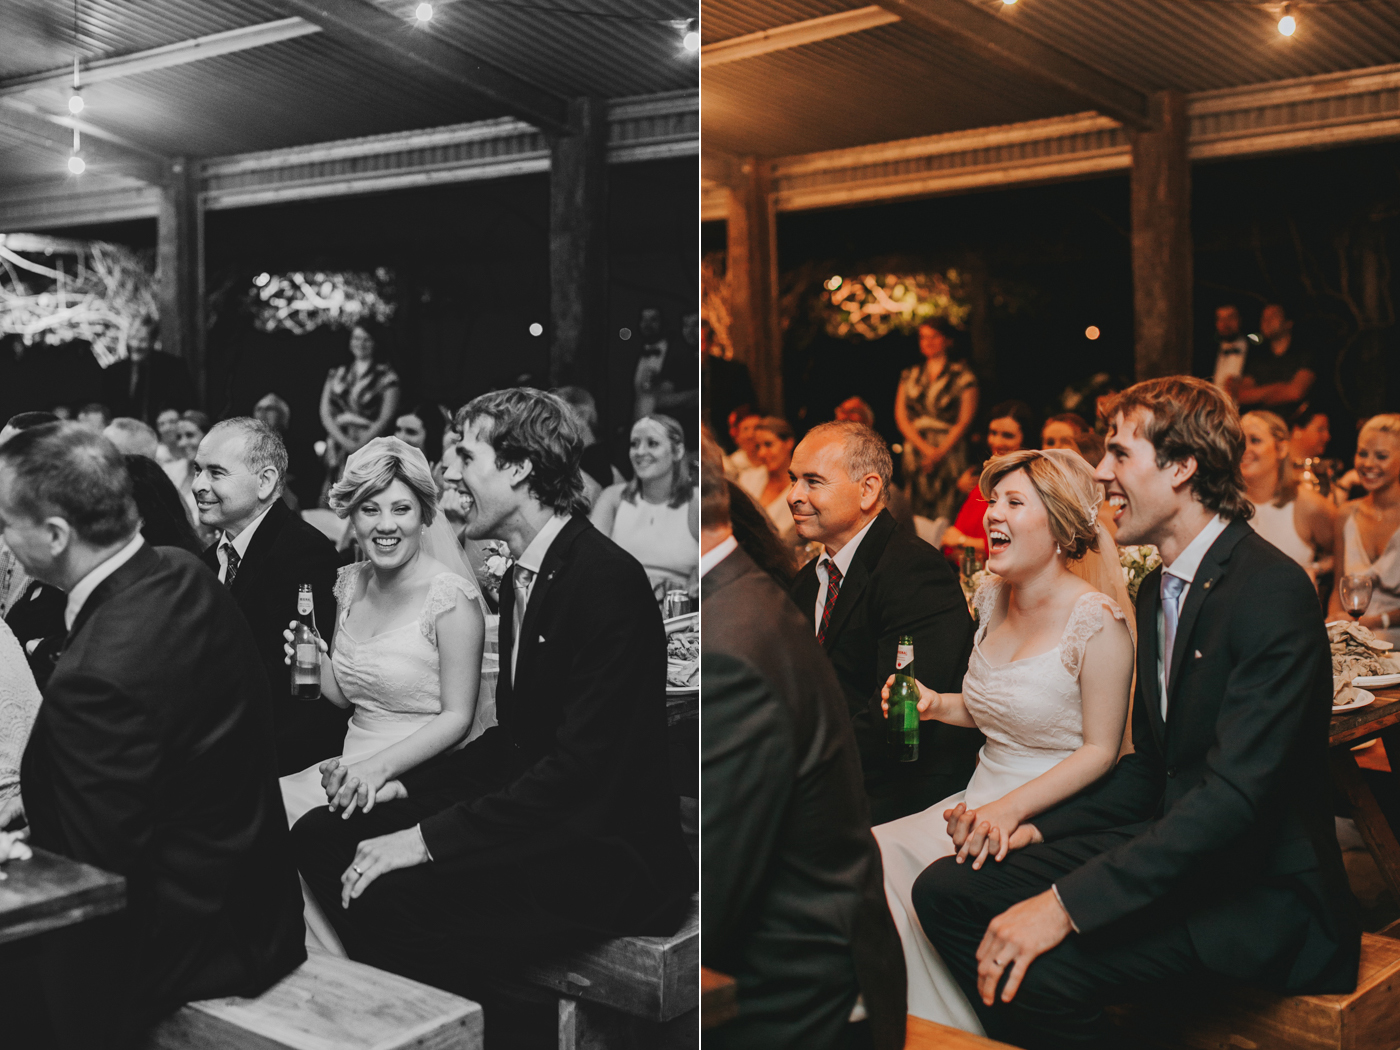 Rachel & Jacob - Willow Farm Berry - South Coast Wedding - Samantha Heather Photography-199.jpg